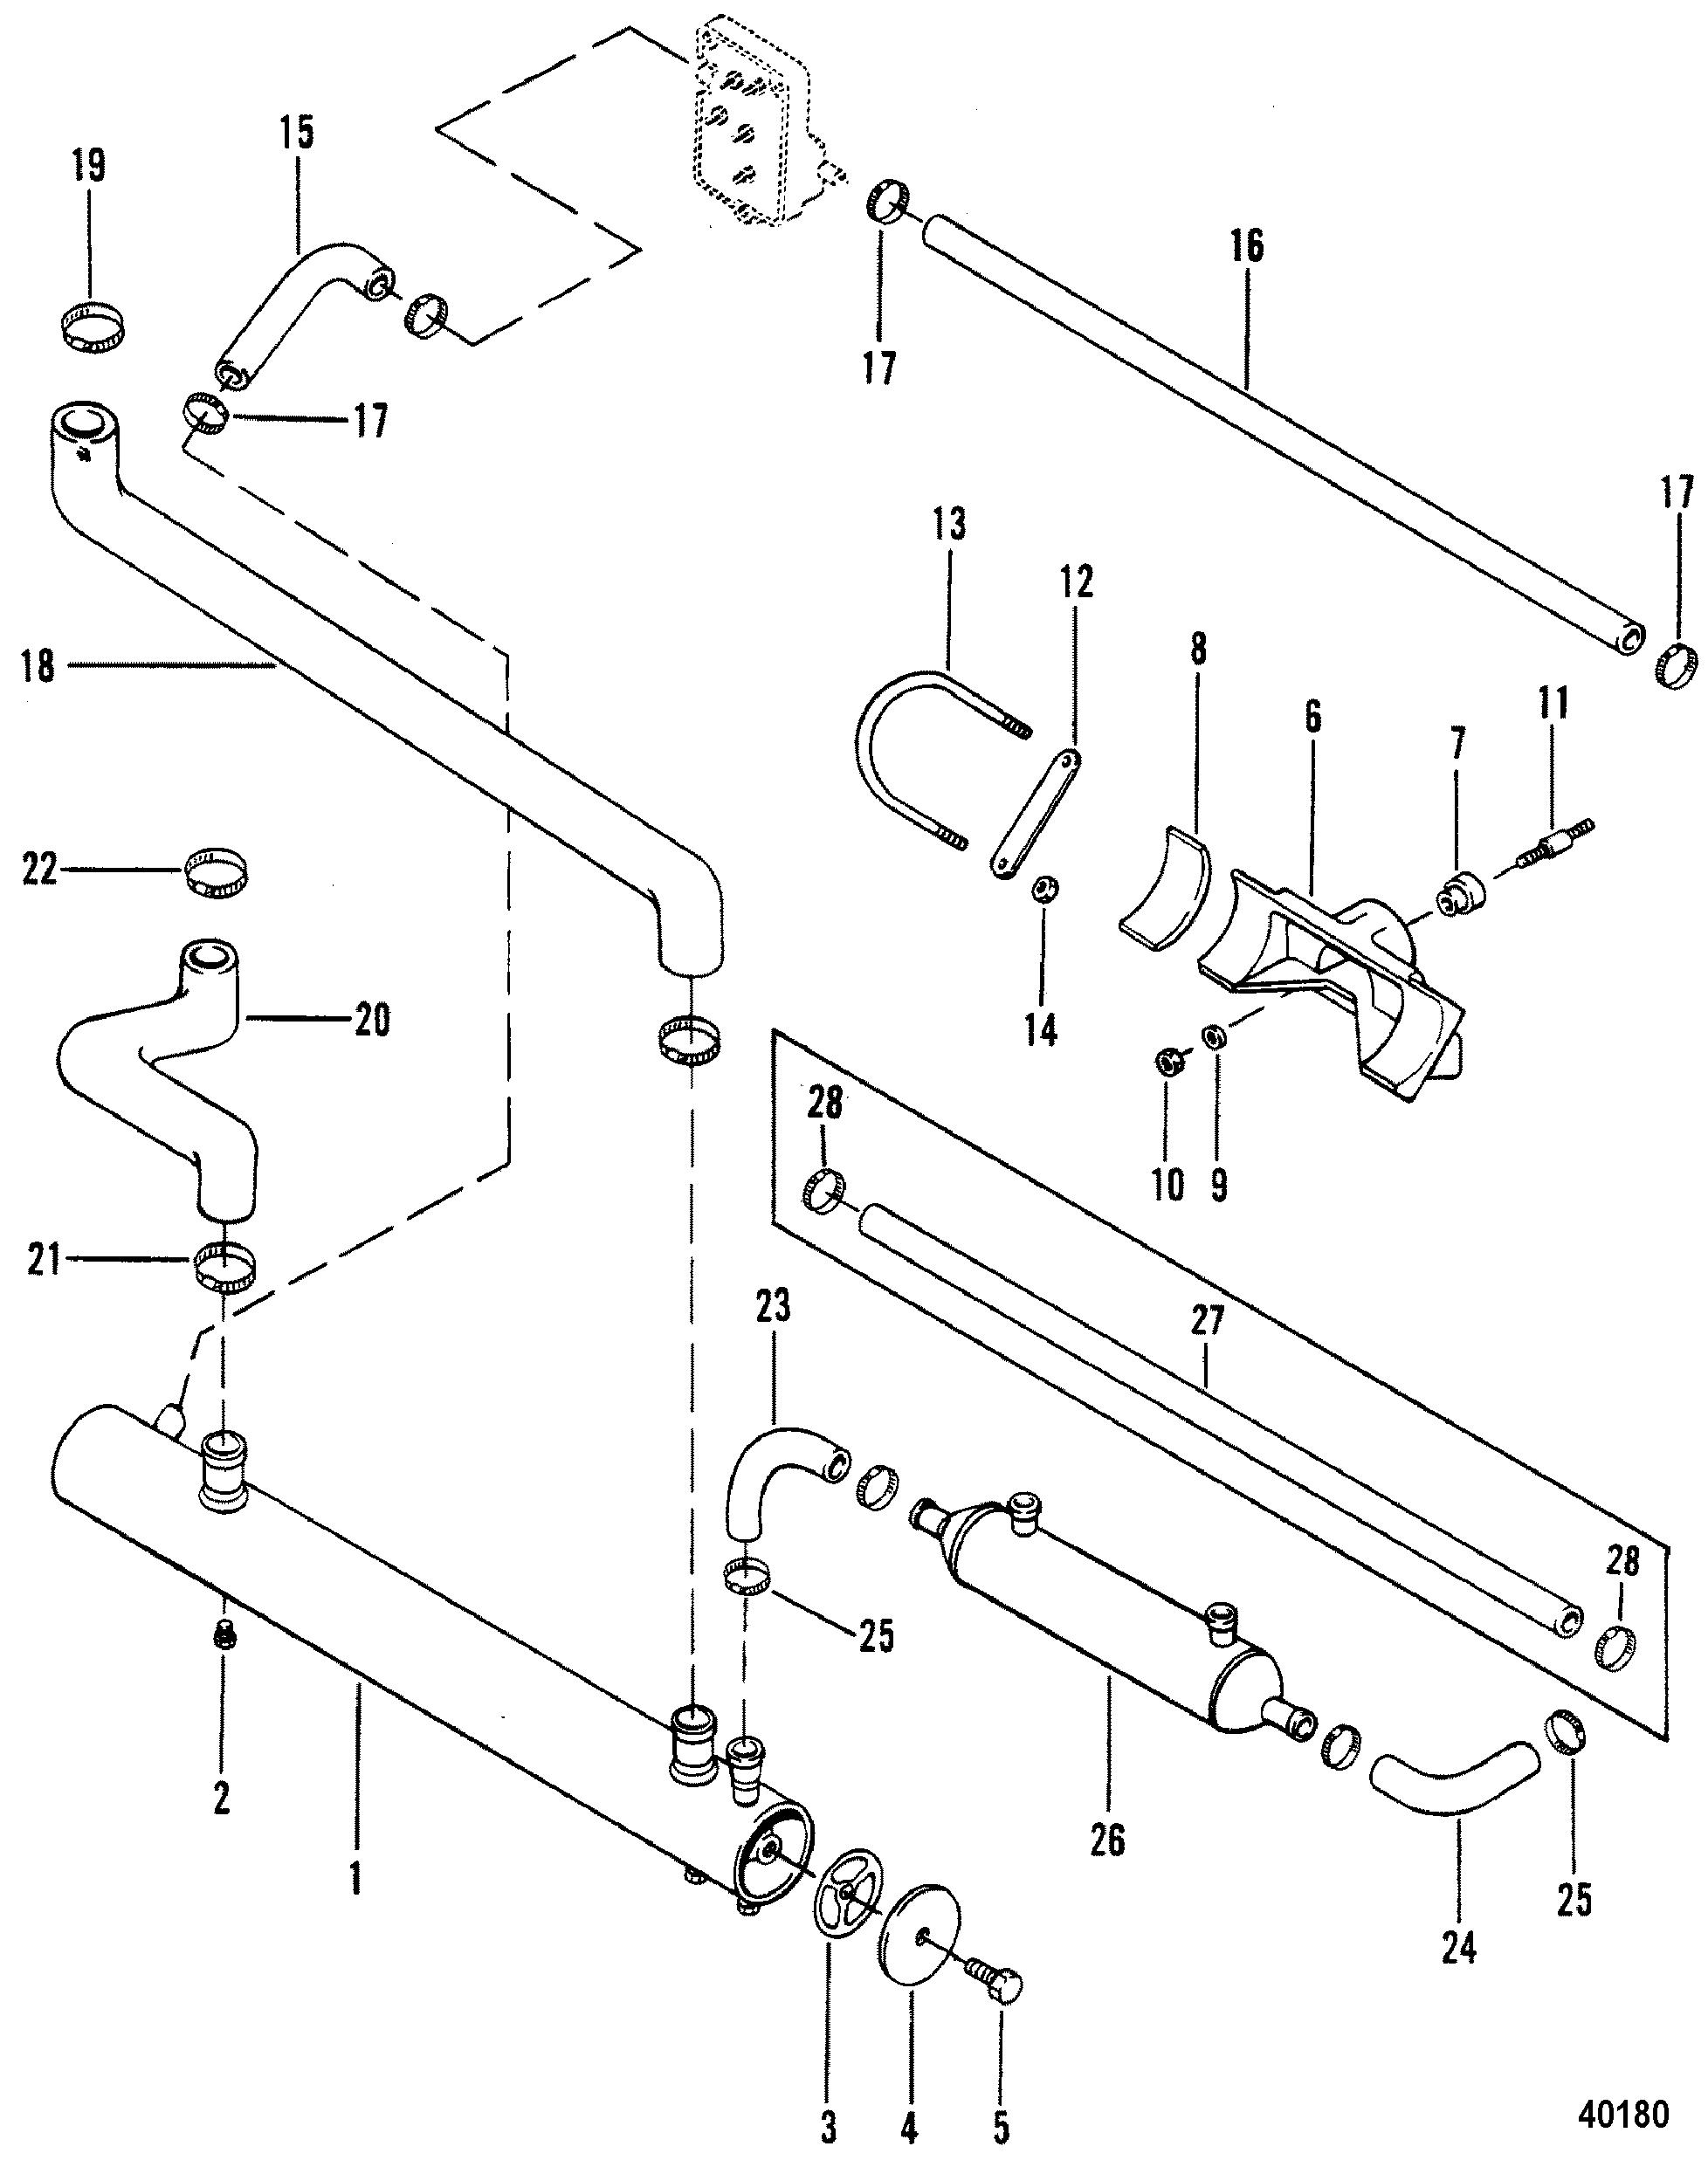 Heat Exchanger For Mercruiser 470 Engine